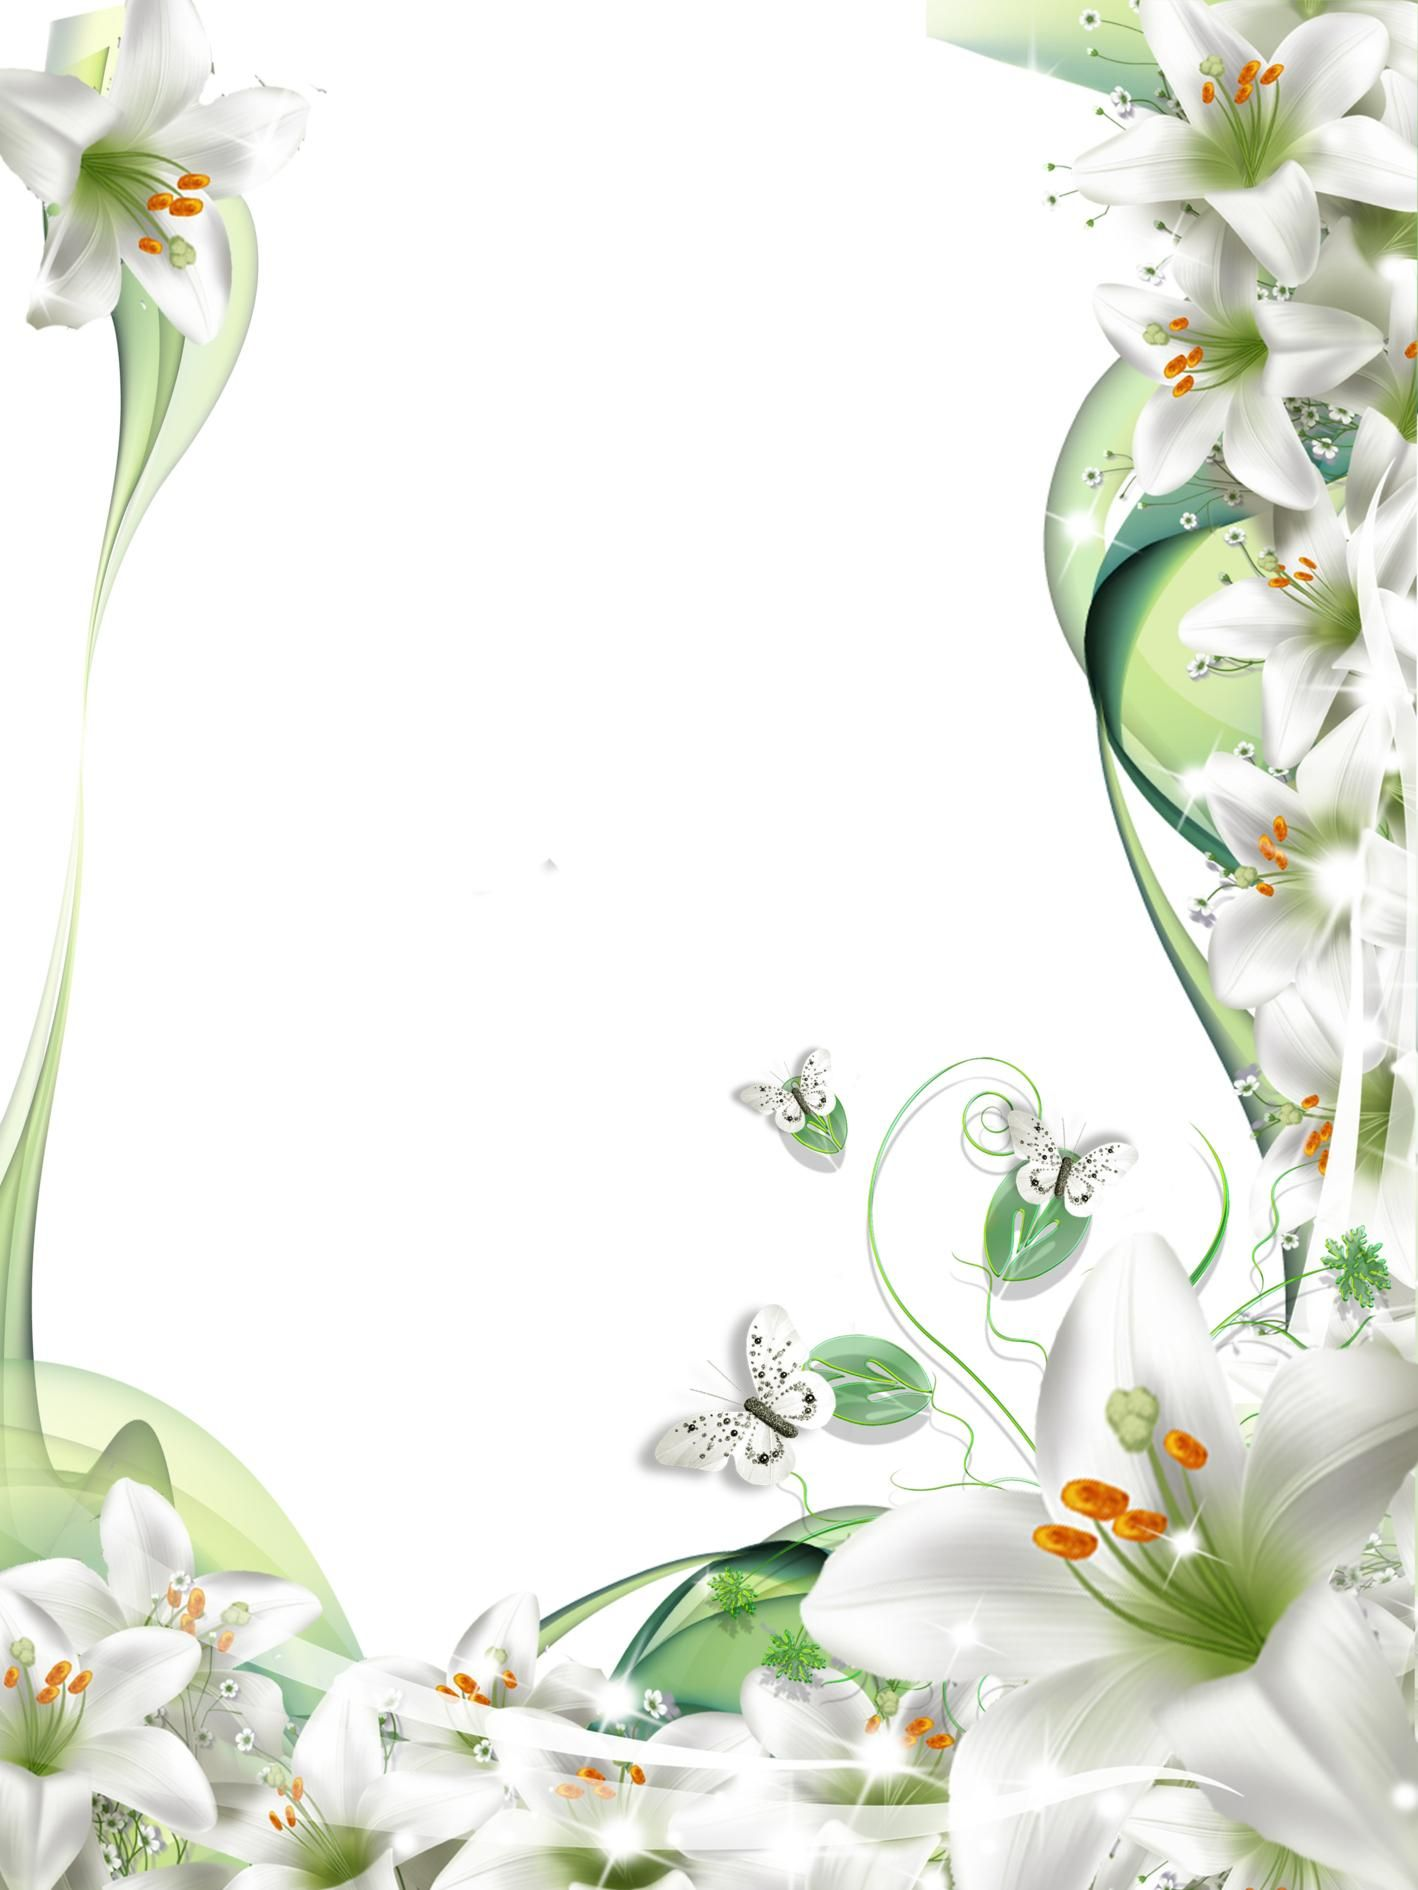 White Lily Flower Flower Frame Lily Flower